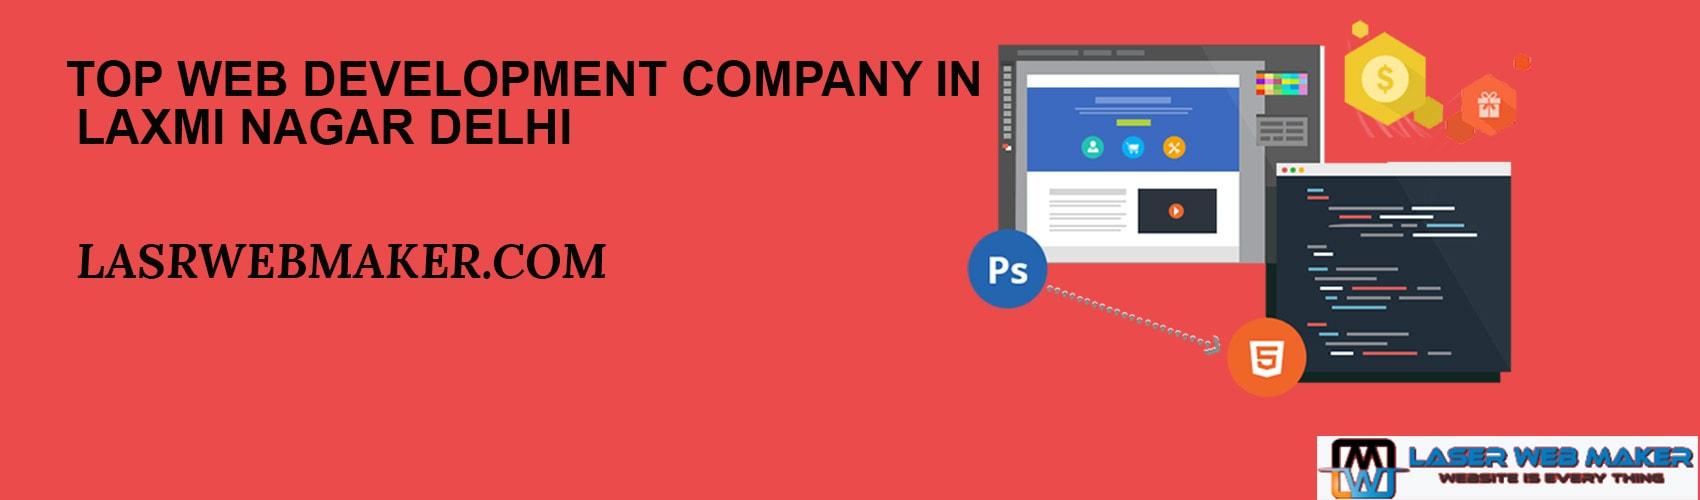 Top Web Development Company In Laxmi Nagar